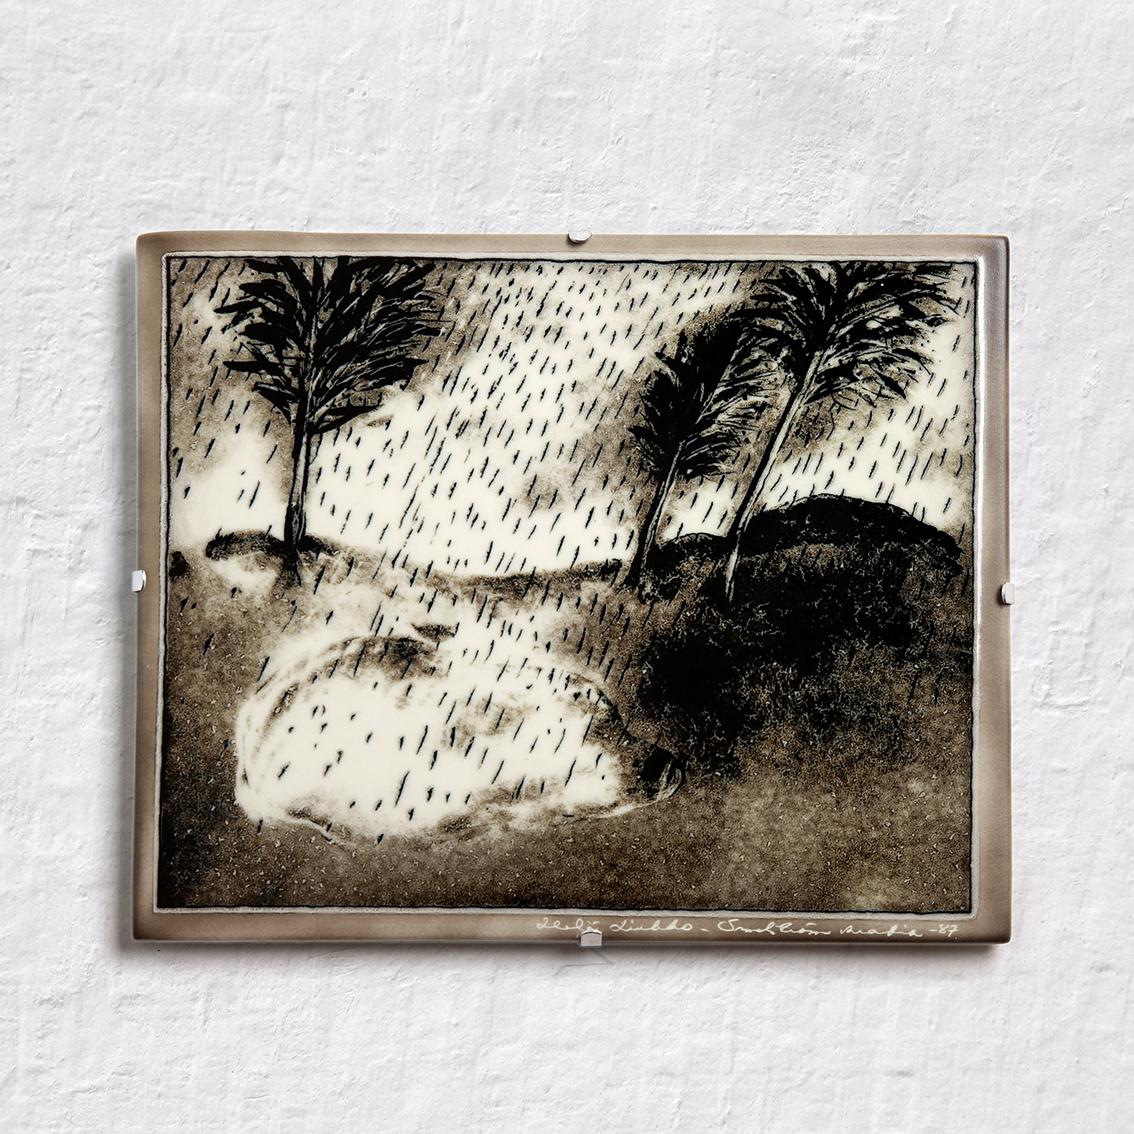 ARABIA アラビア Helja Liukko-Sundstrom ヘルヤ リウッコ スンドストロム 九月の陶板(オリジナル紙箱入り) 北欧ヴィンテージ